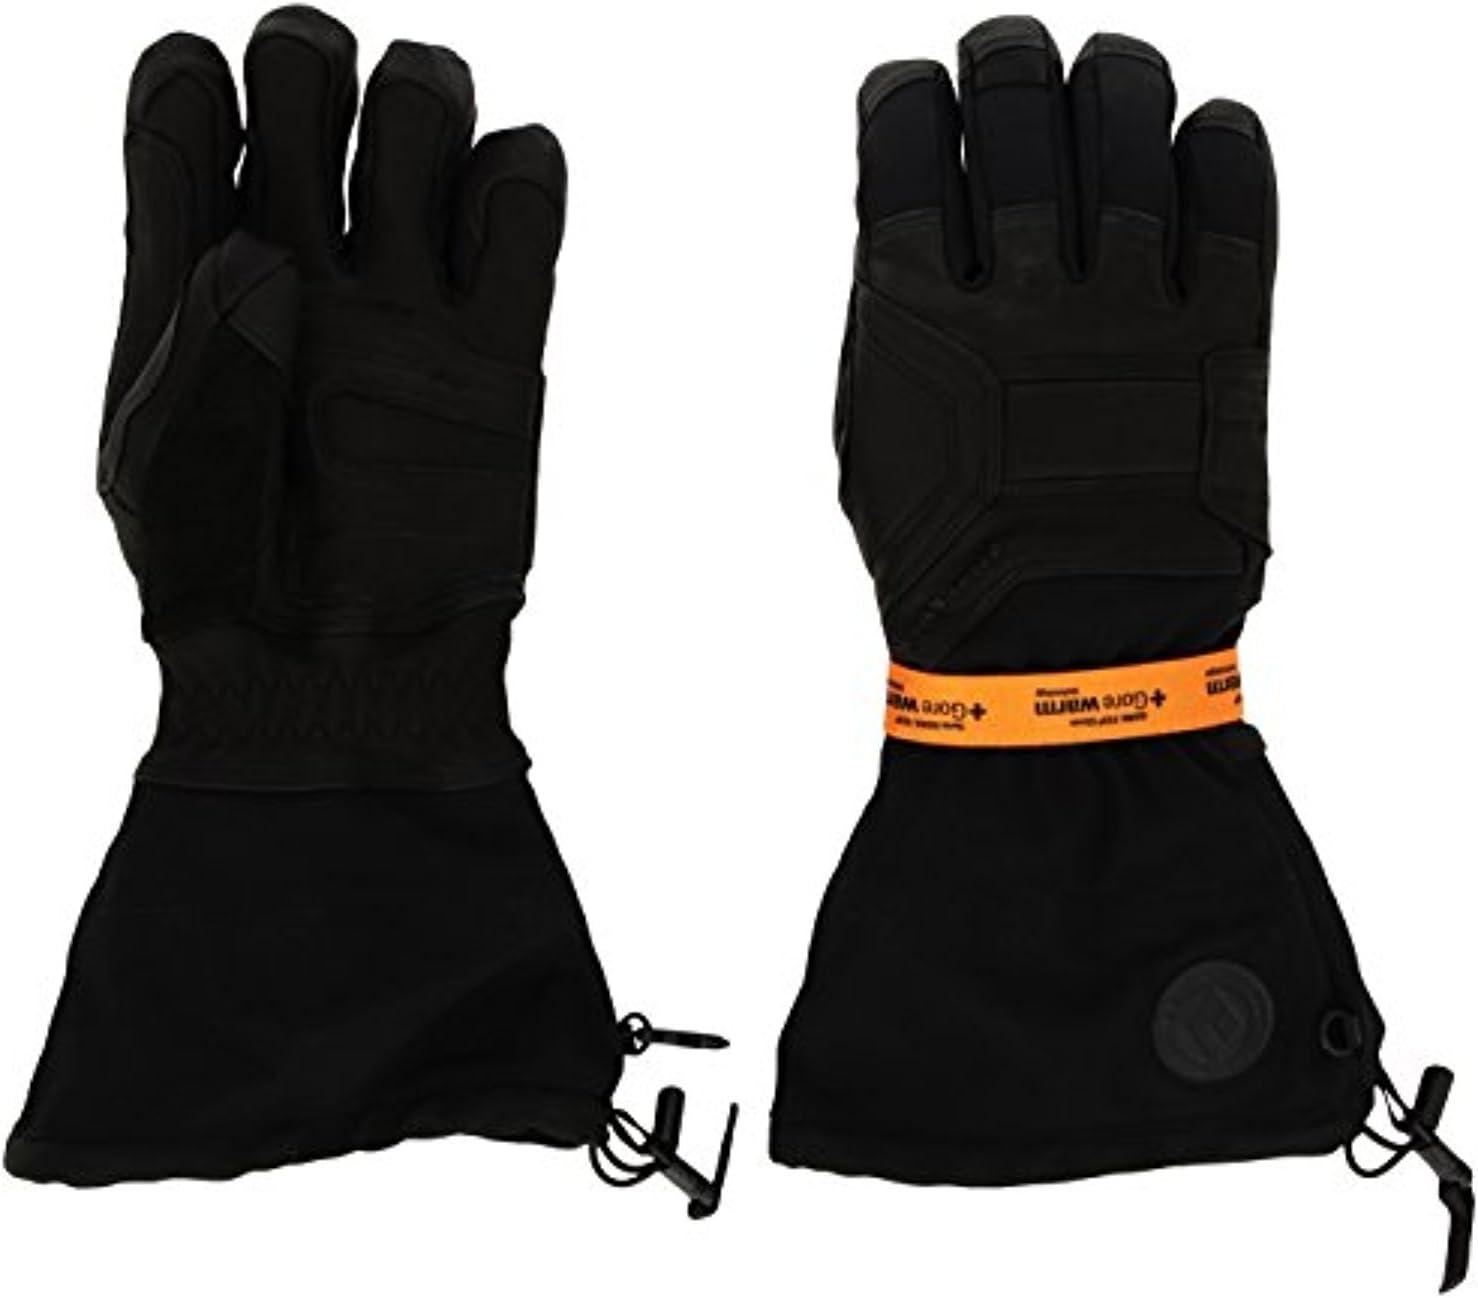 Black Diamond Guide Gloves /& Cooling Towel Bundle